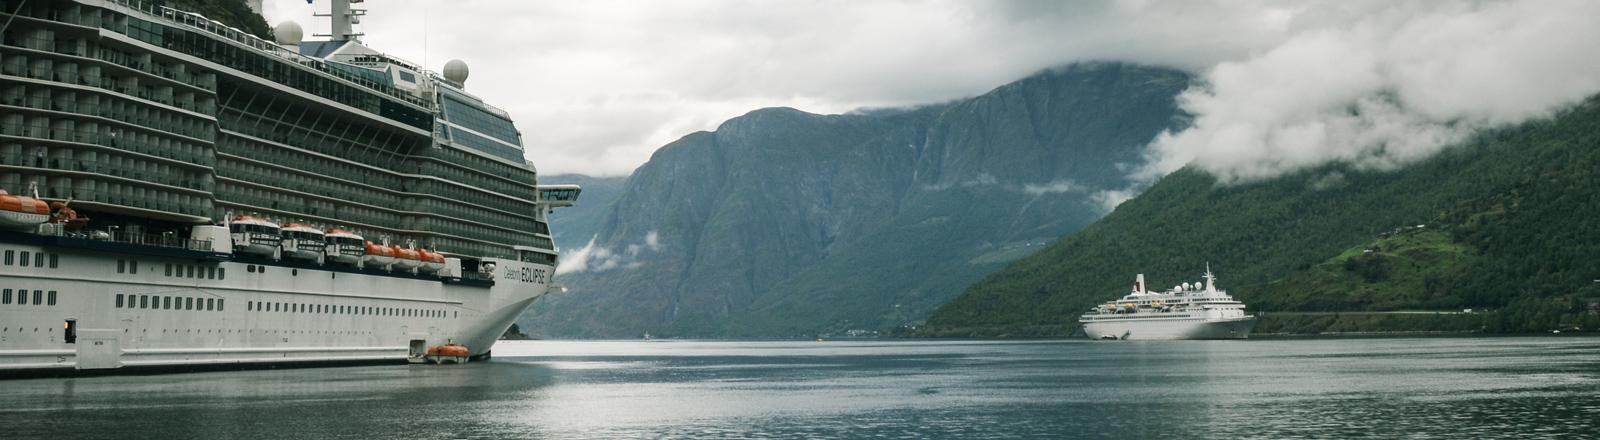 Kreuzfahrtschiffe in norwegischen Fjorden